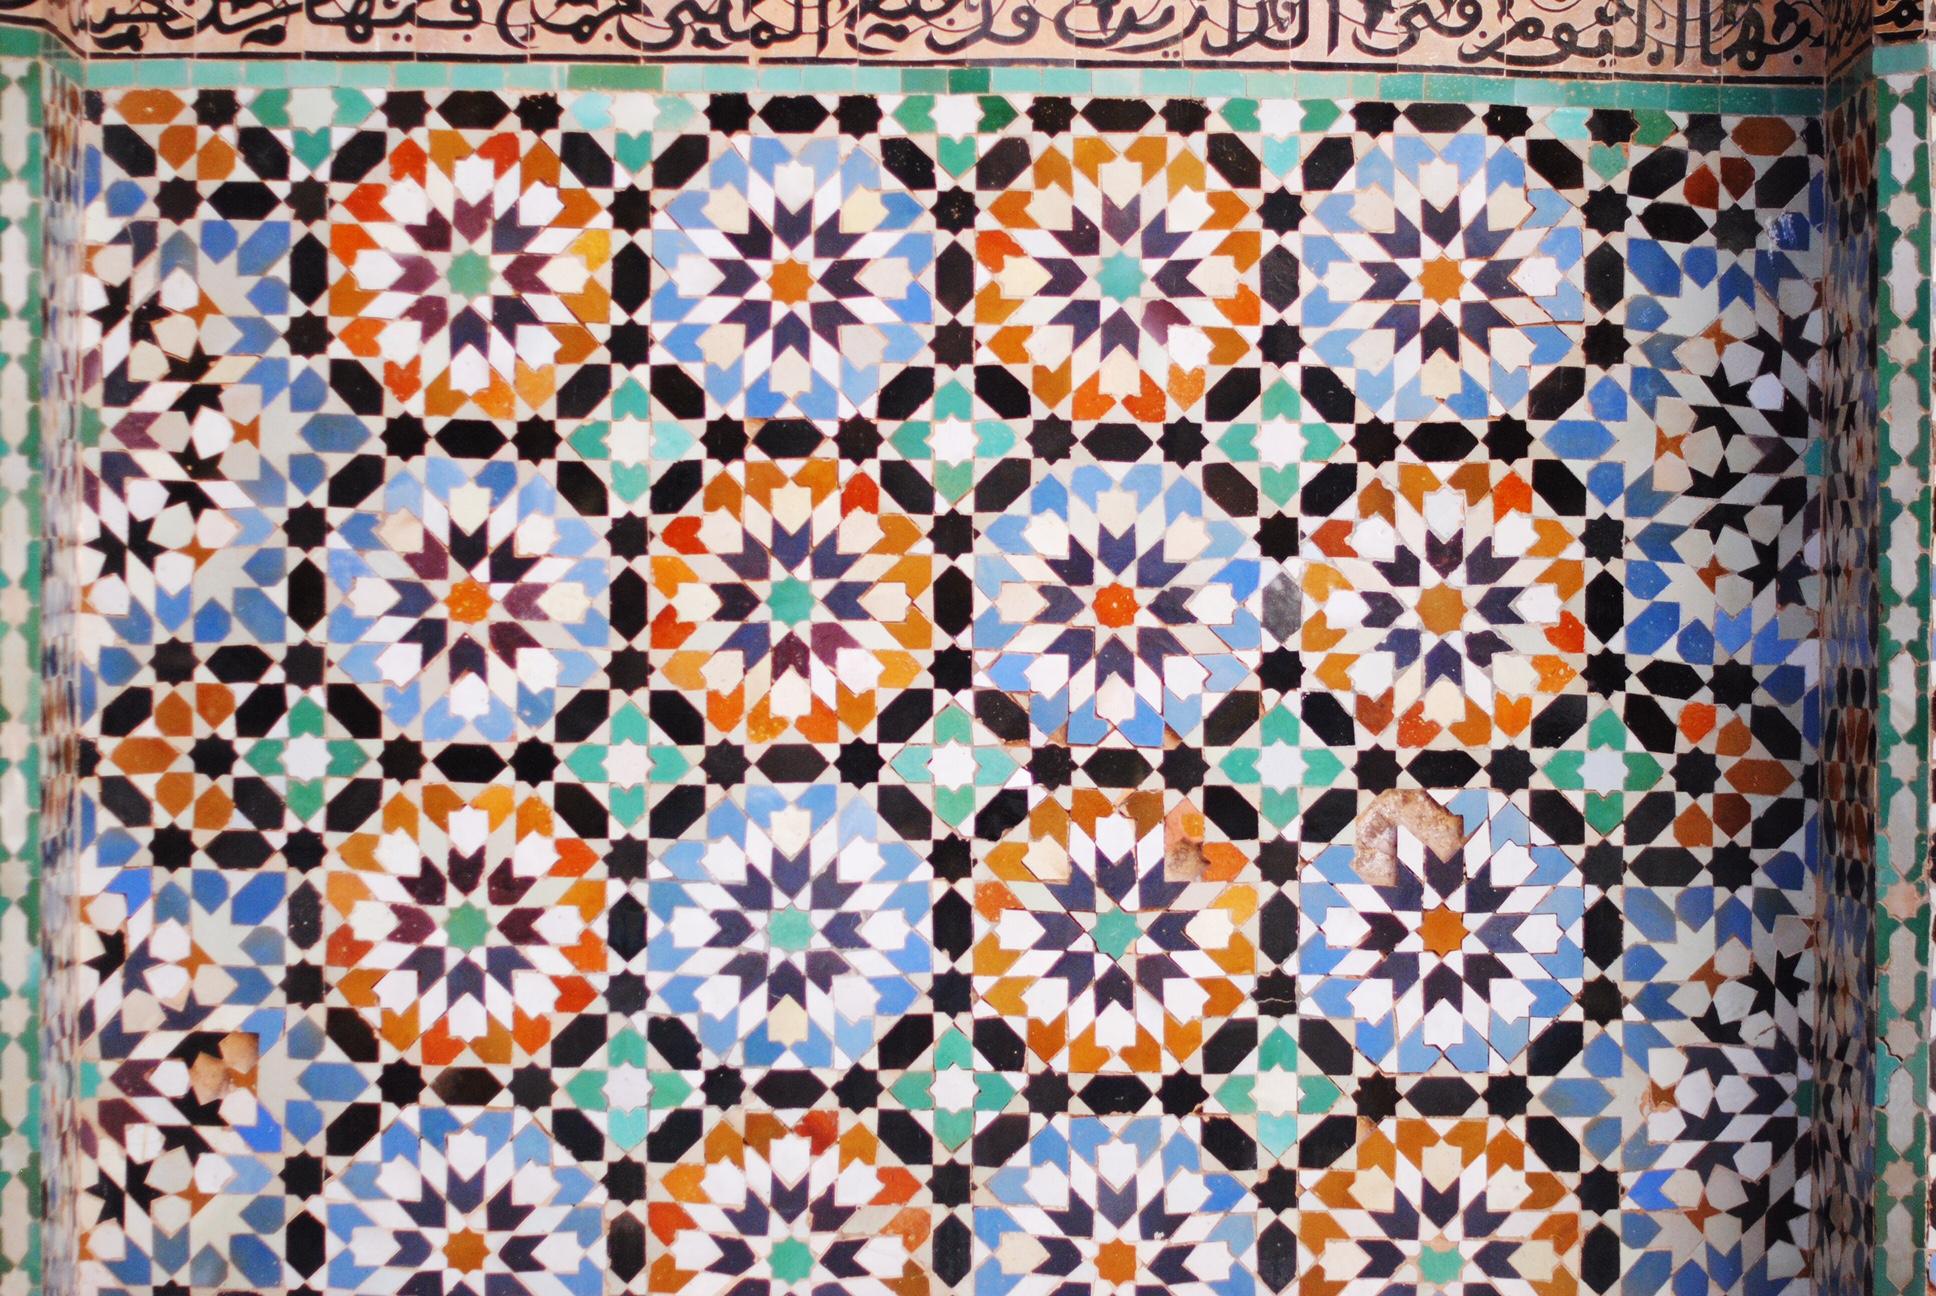 ben-youssef-madrasa-wall-mosaics